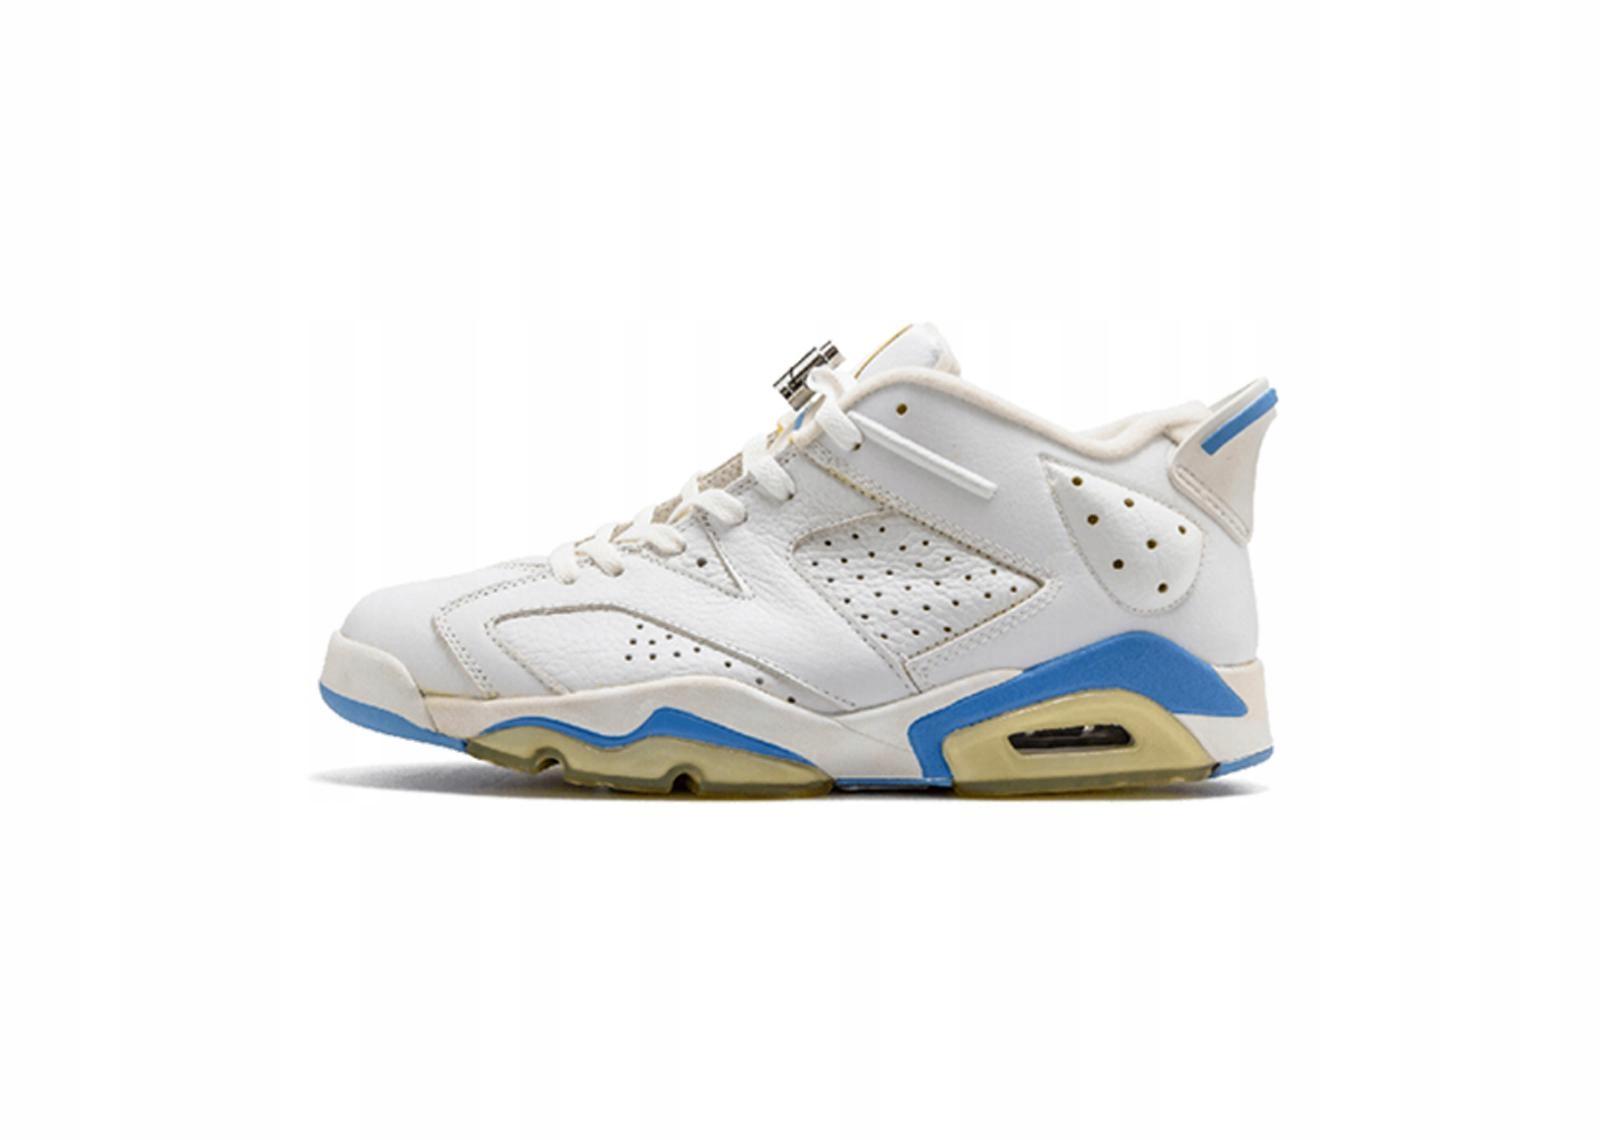 Basketbalové topánky Nike Air Jordan 6 Retro Low